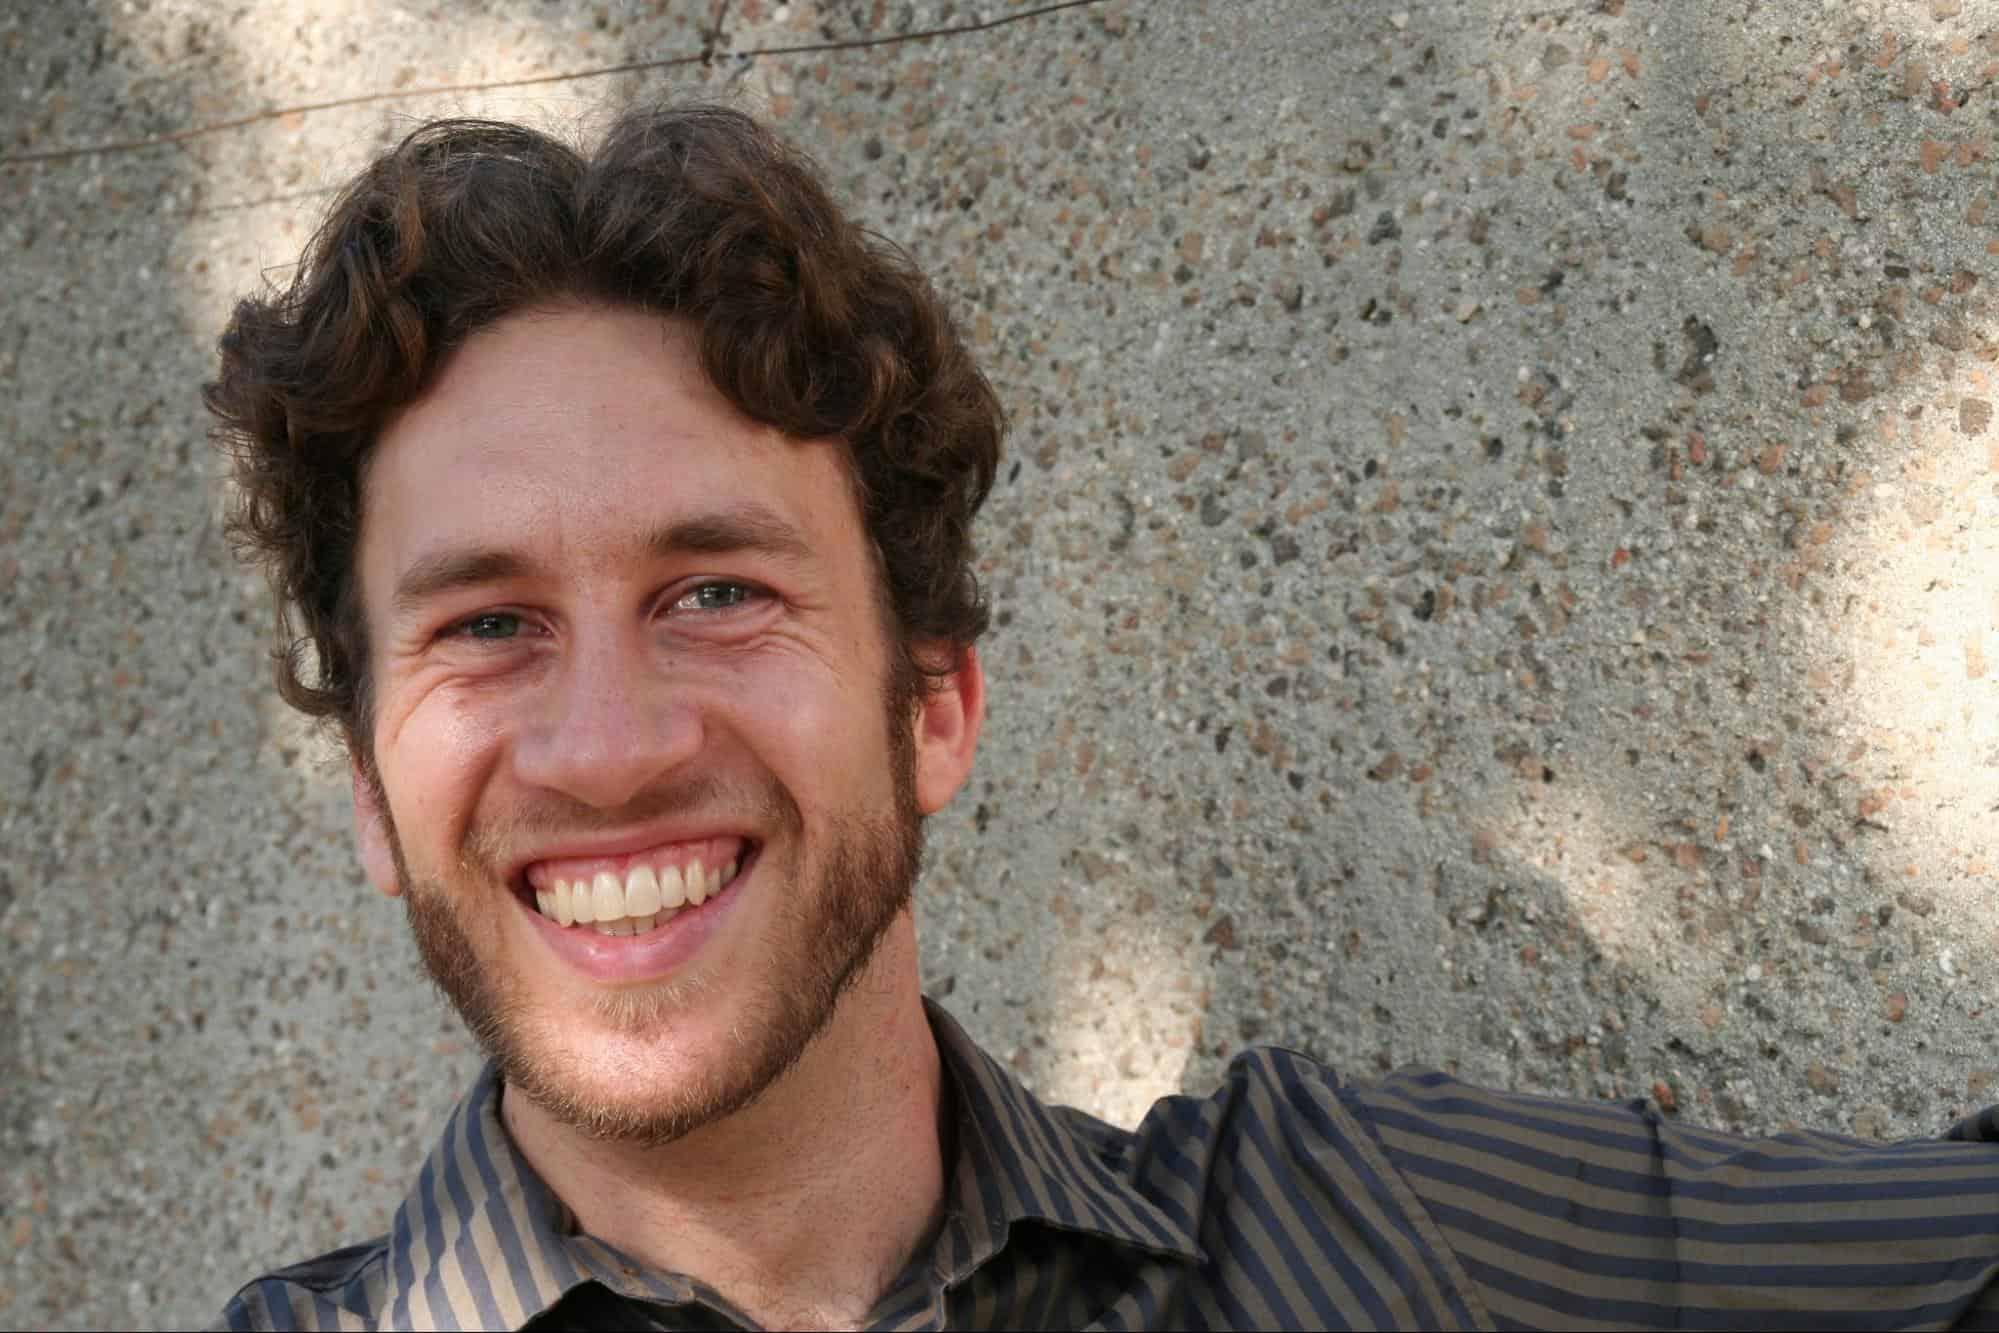 MAN headshot smile Apr 2010.jpg